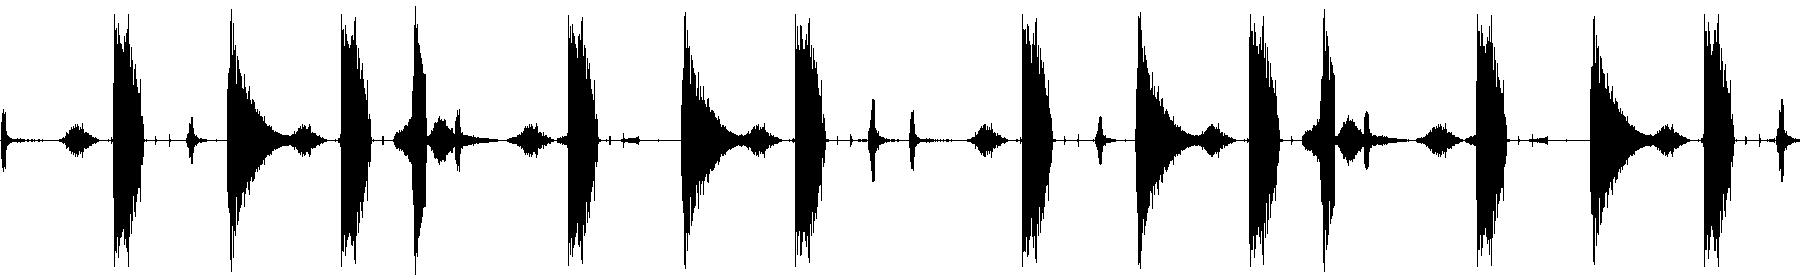 shg percussion loop 12